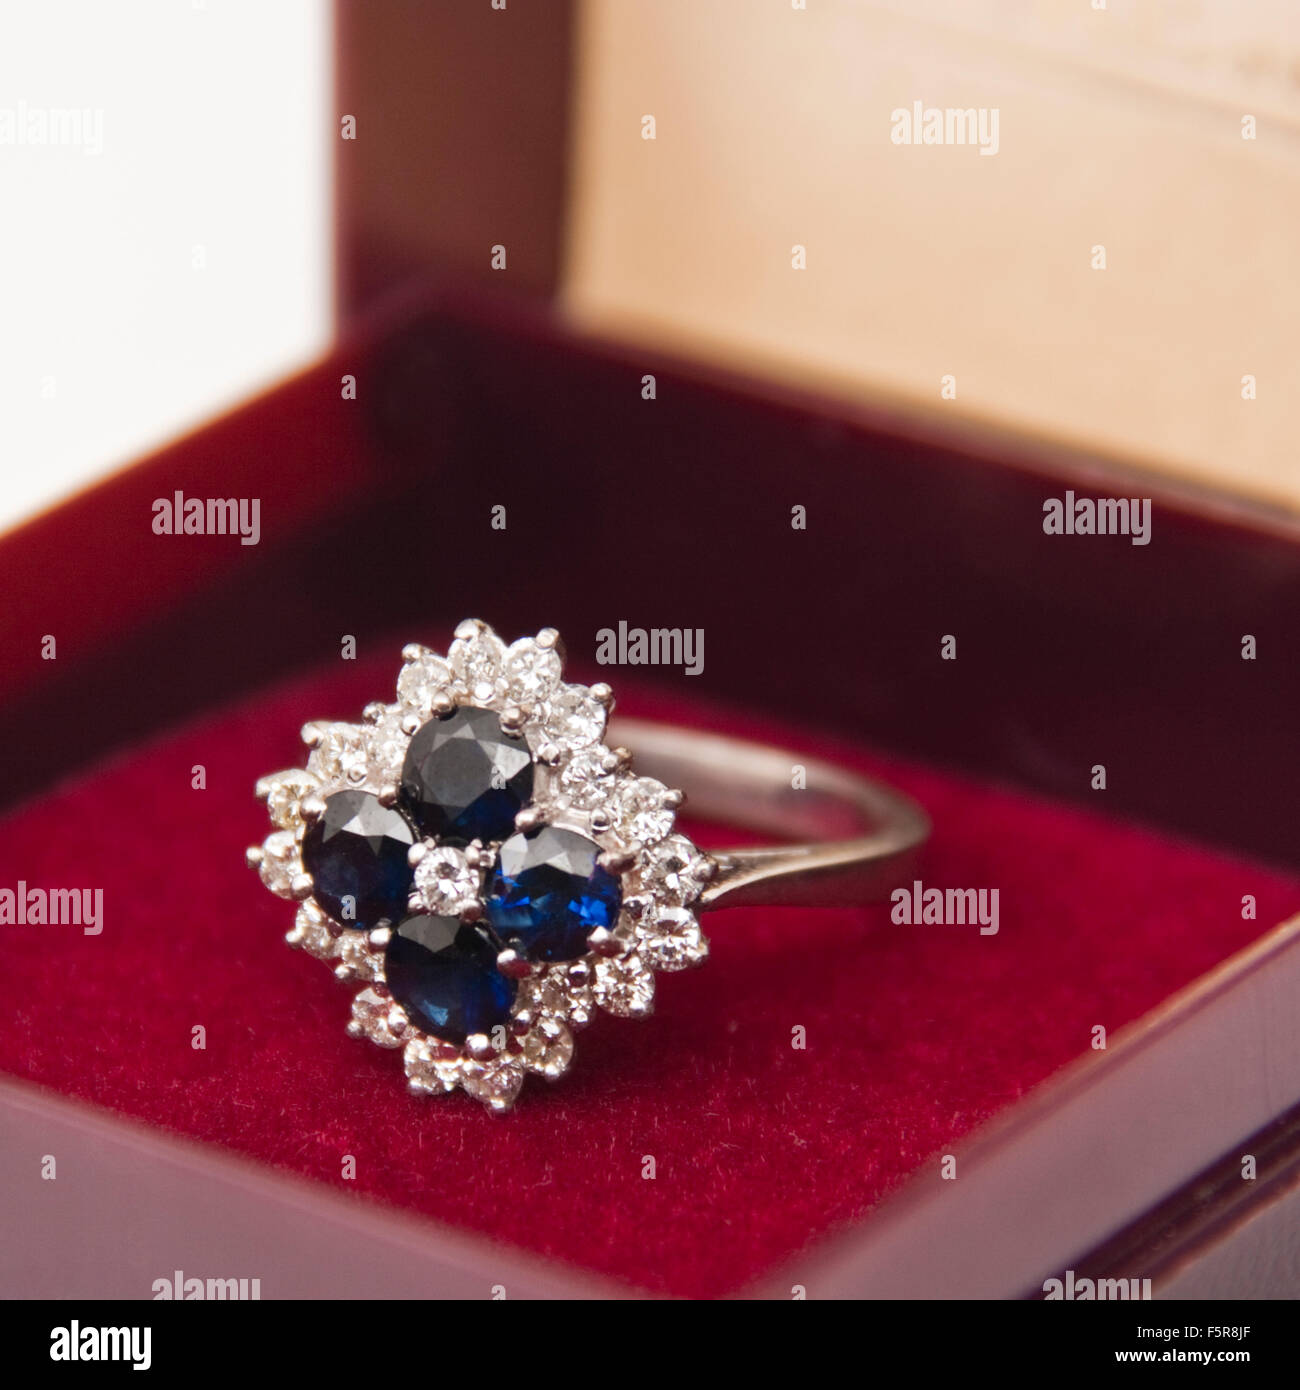 Elizabeth Duke of Bond Street London 18ct gold diamond ring Stock